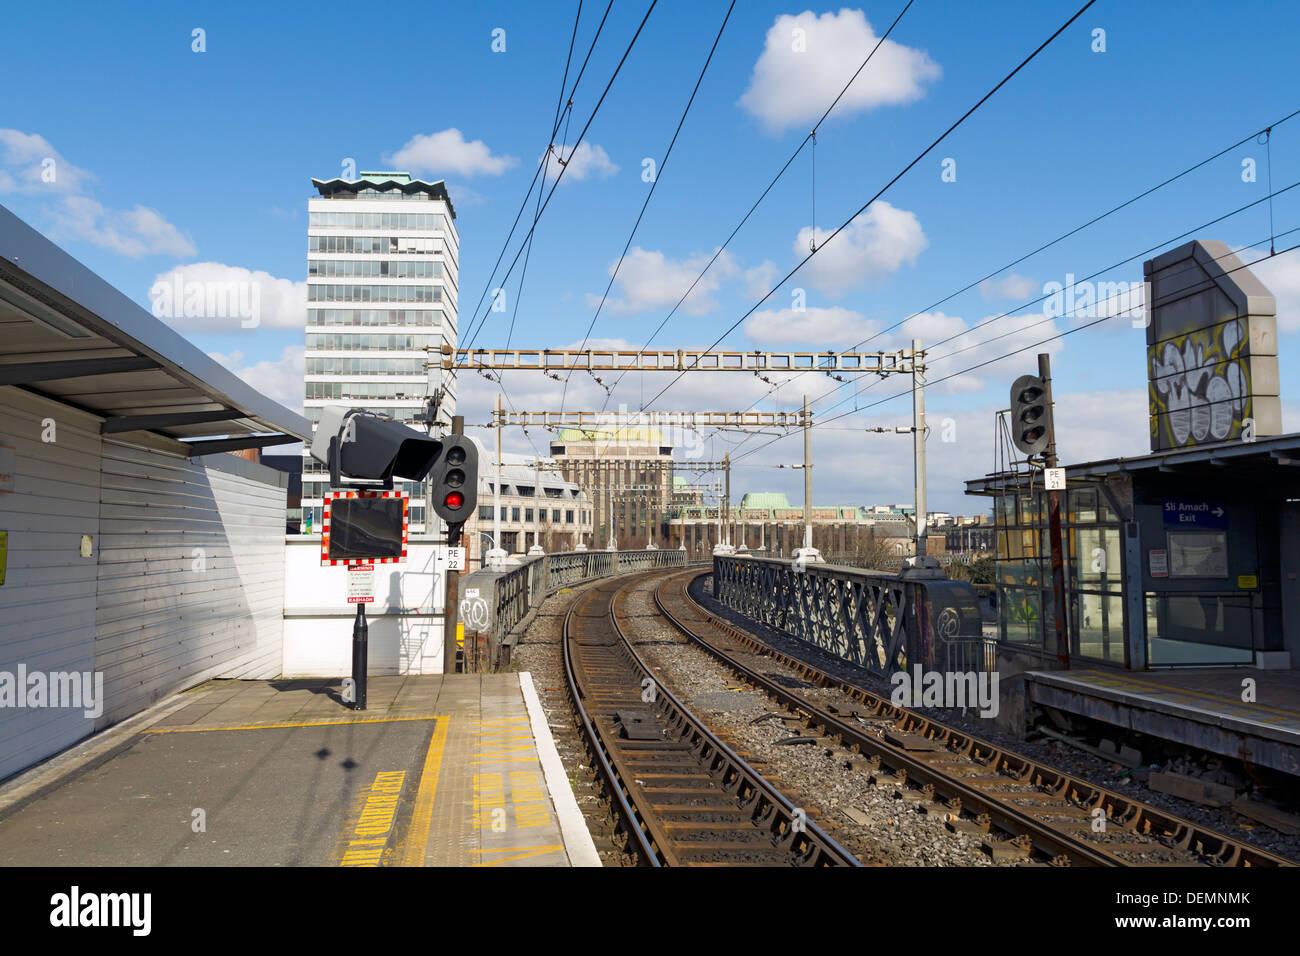 Railway Station Platform in Dublin Ireland - Stock Image